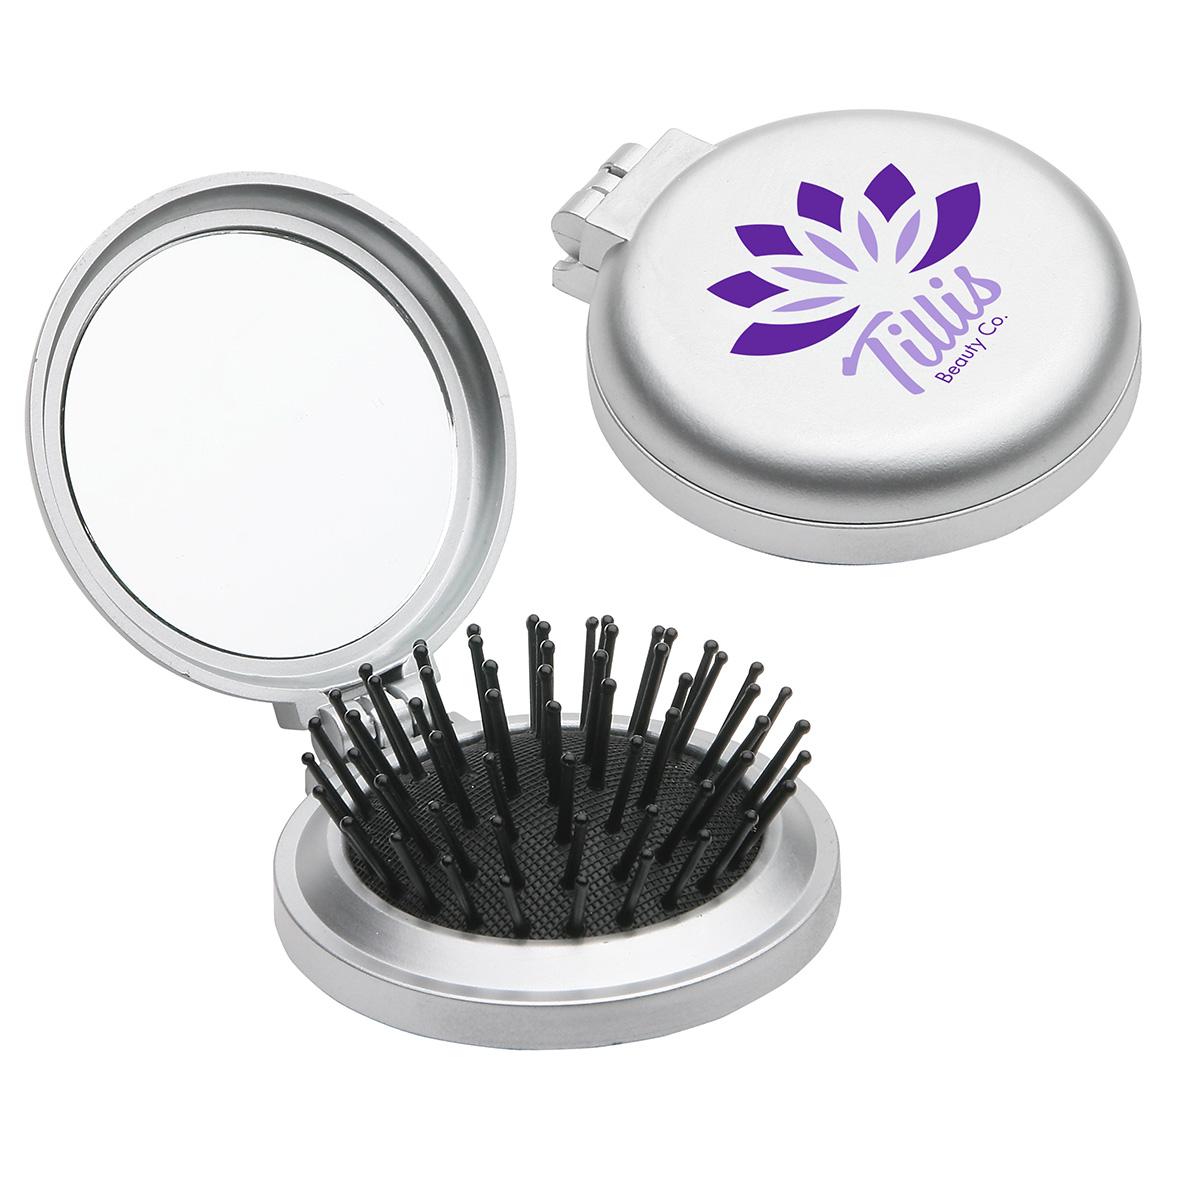 Travel Disk Brush & Mirror, WTV-TD10 - 1 Colour Imprint